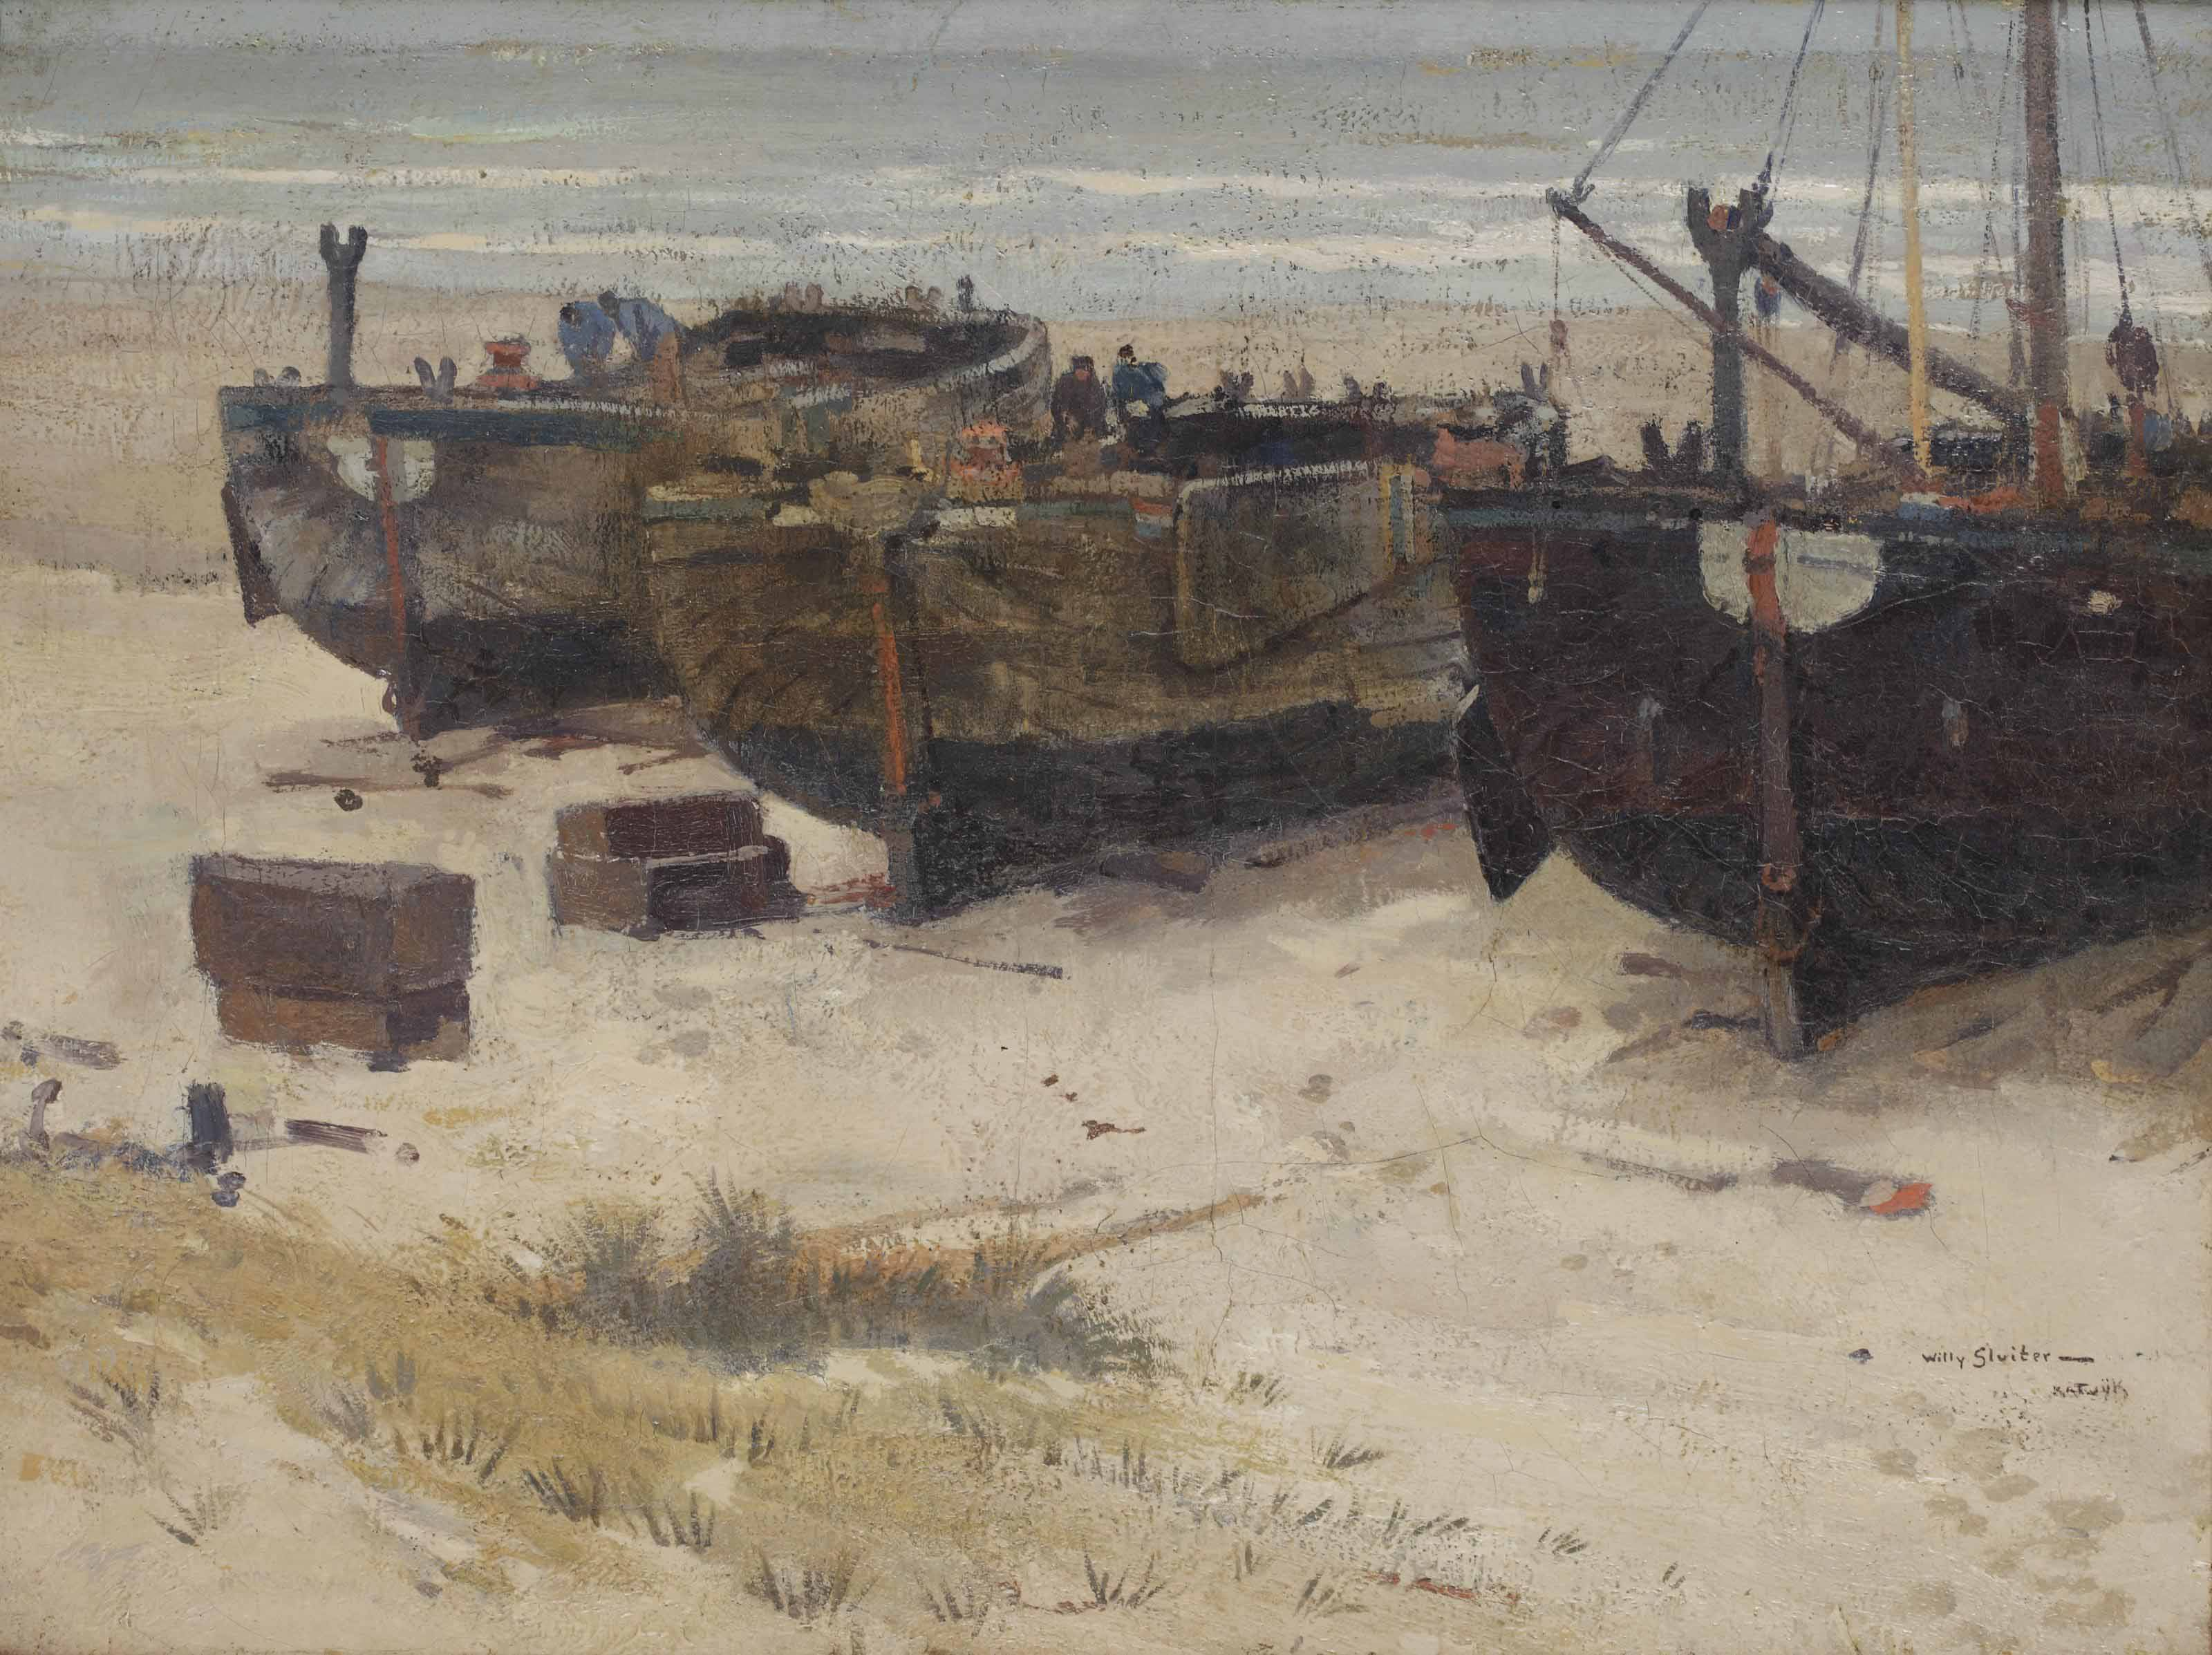 Willy Sluiter (Amersfoort 1873